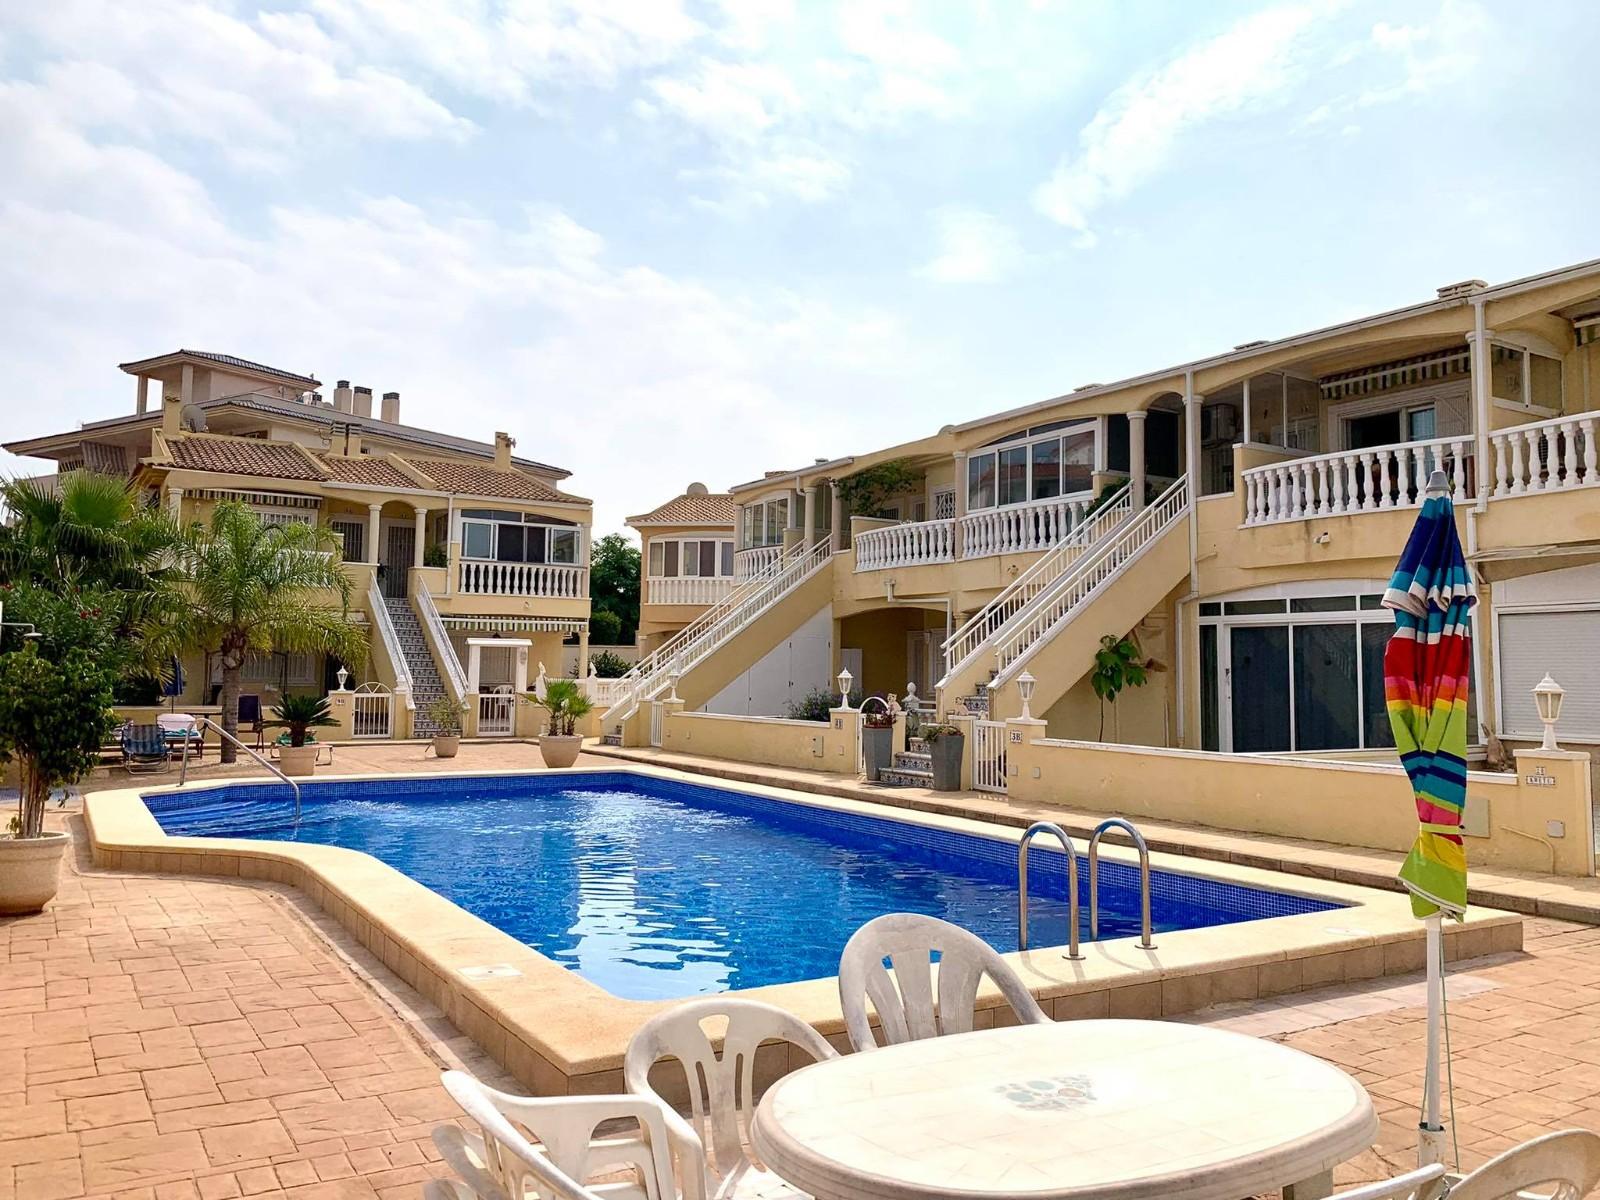 For sale: 2 bedroom apartment / flat in La Mata, Costa Blanca